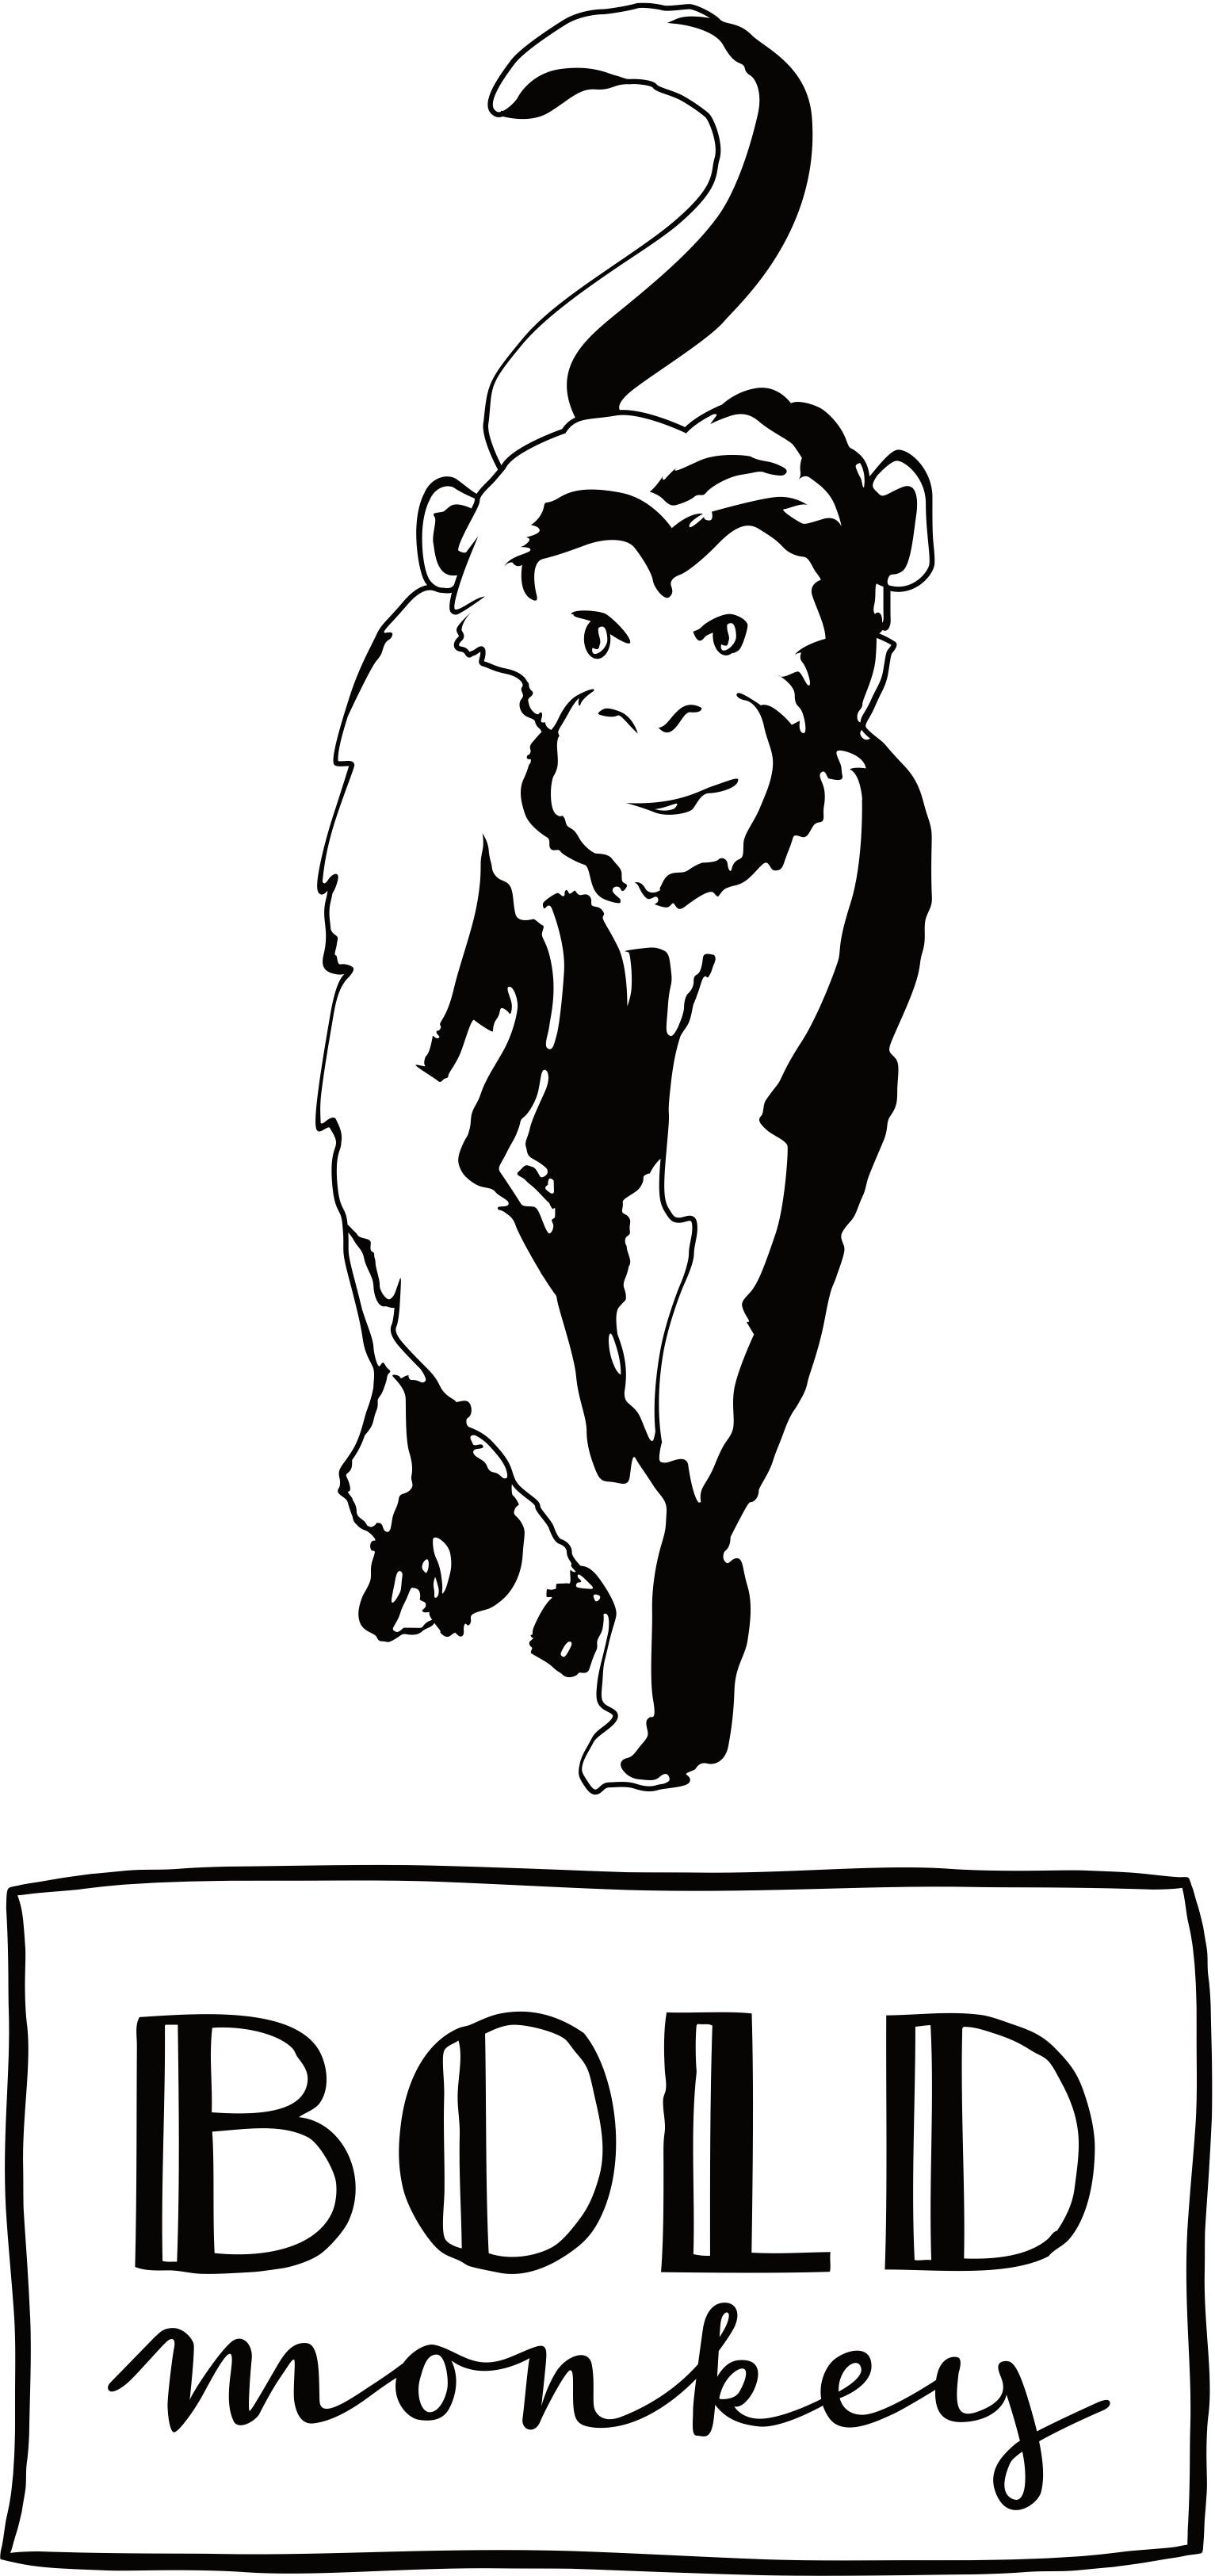 bold monkey Devilish Bulldog deco light geel